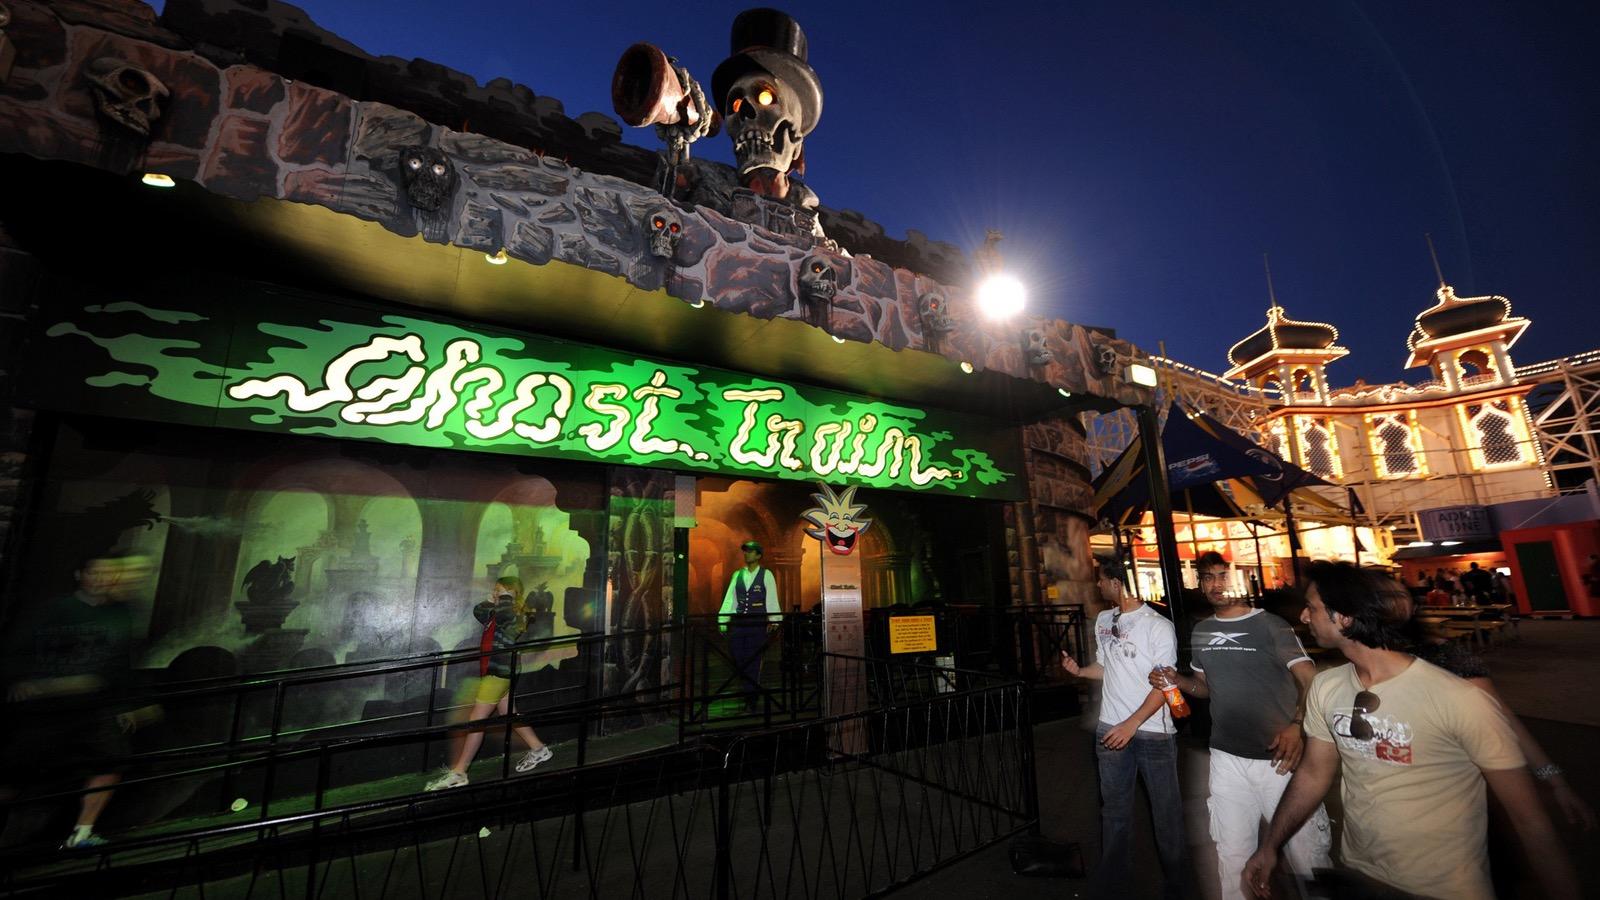 Spooky funon the Ghost Train